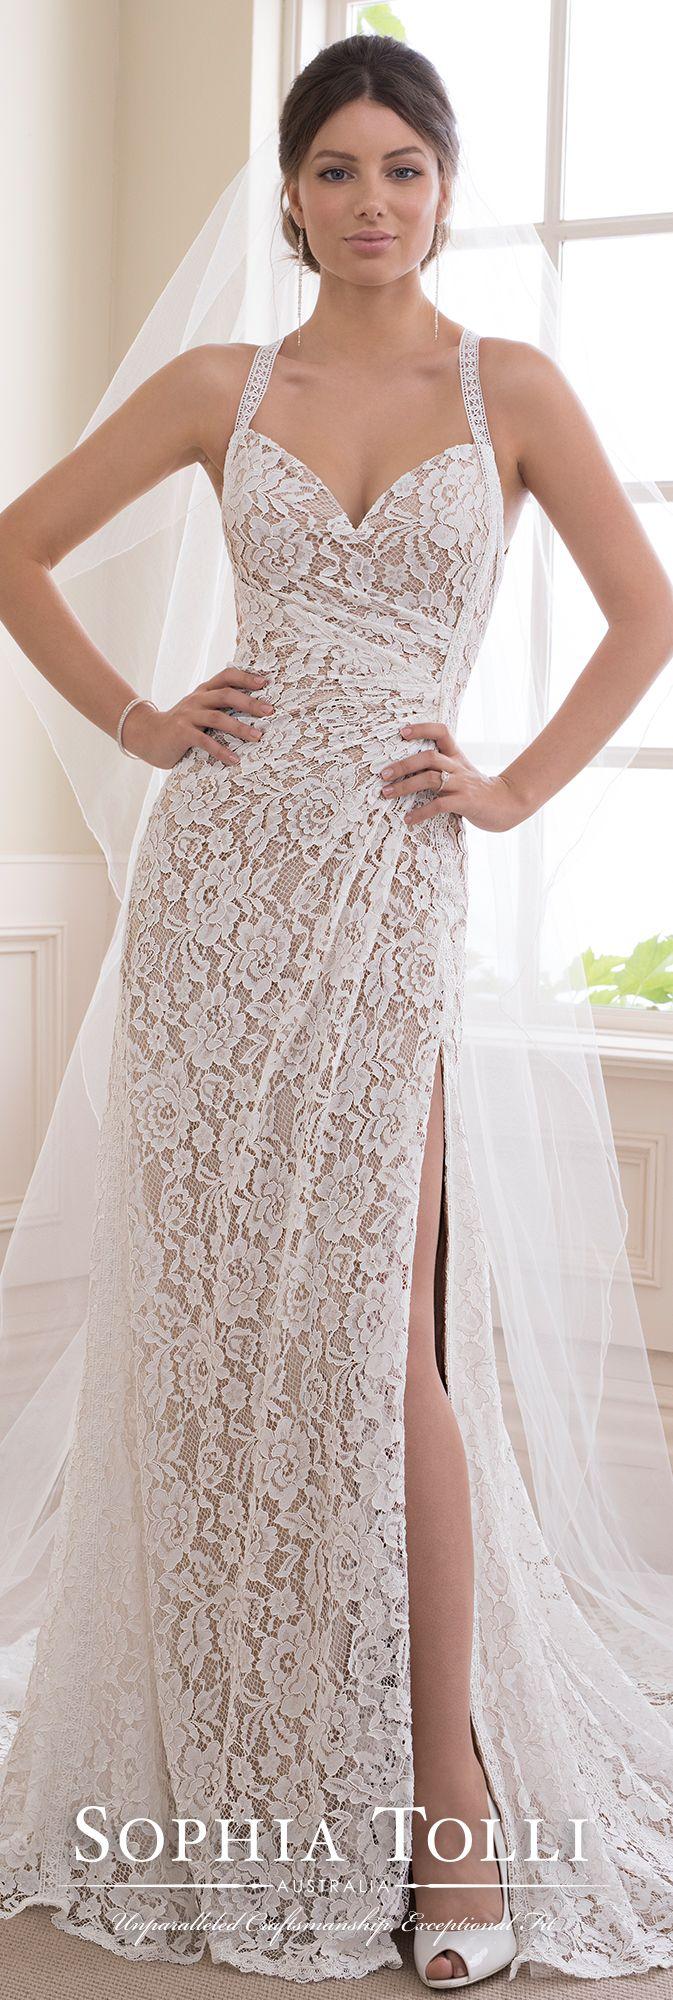 Boho chic allover lace sheath halter wedding gown vintage wedding